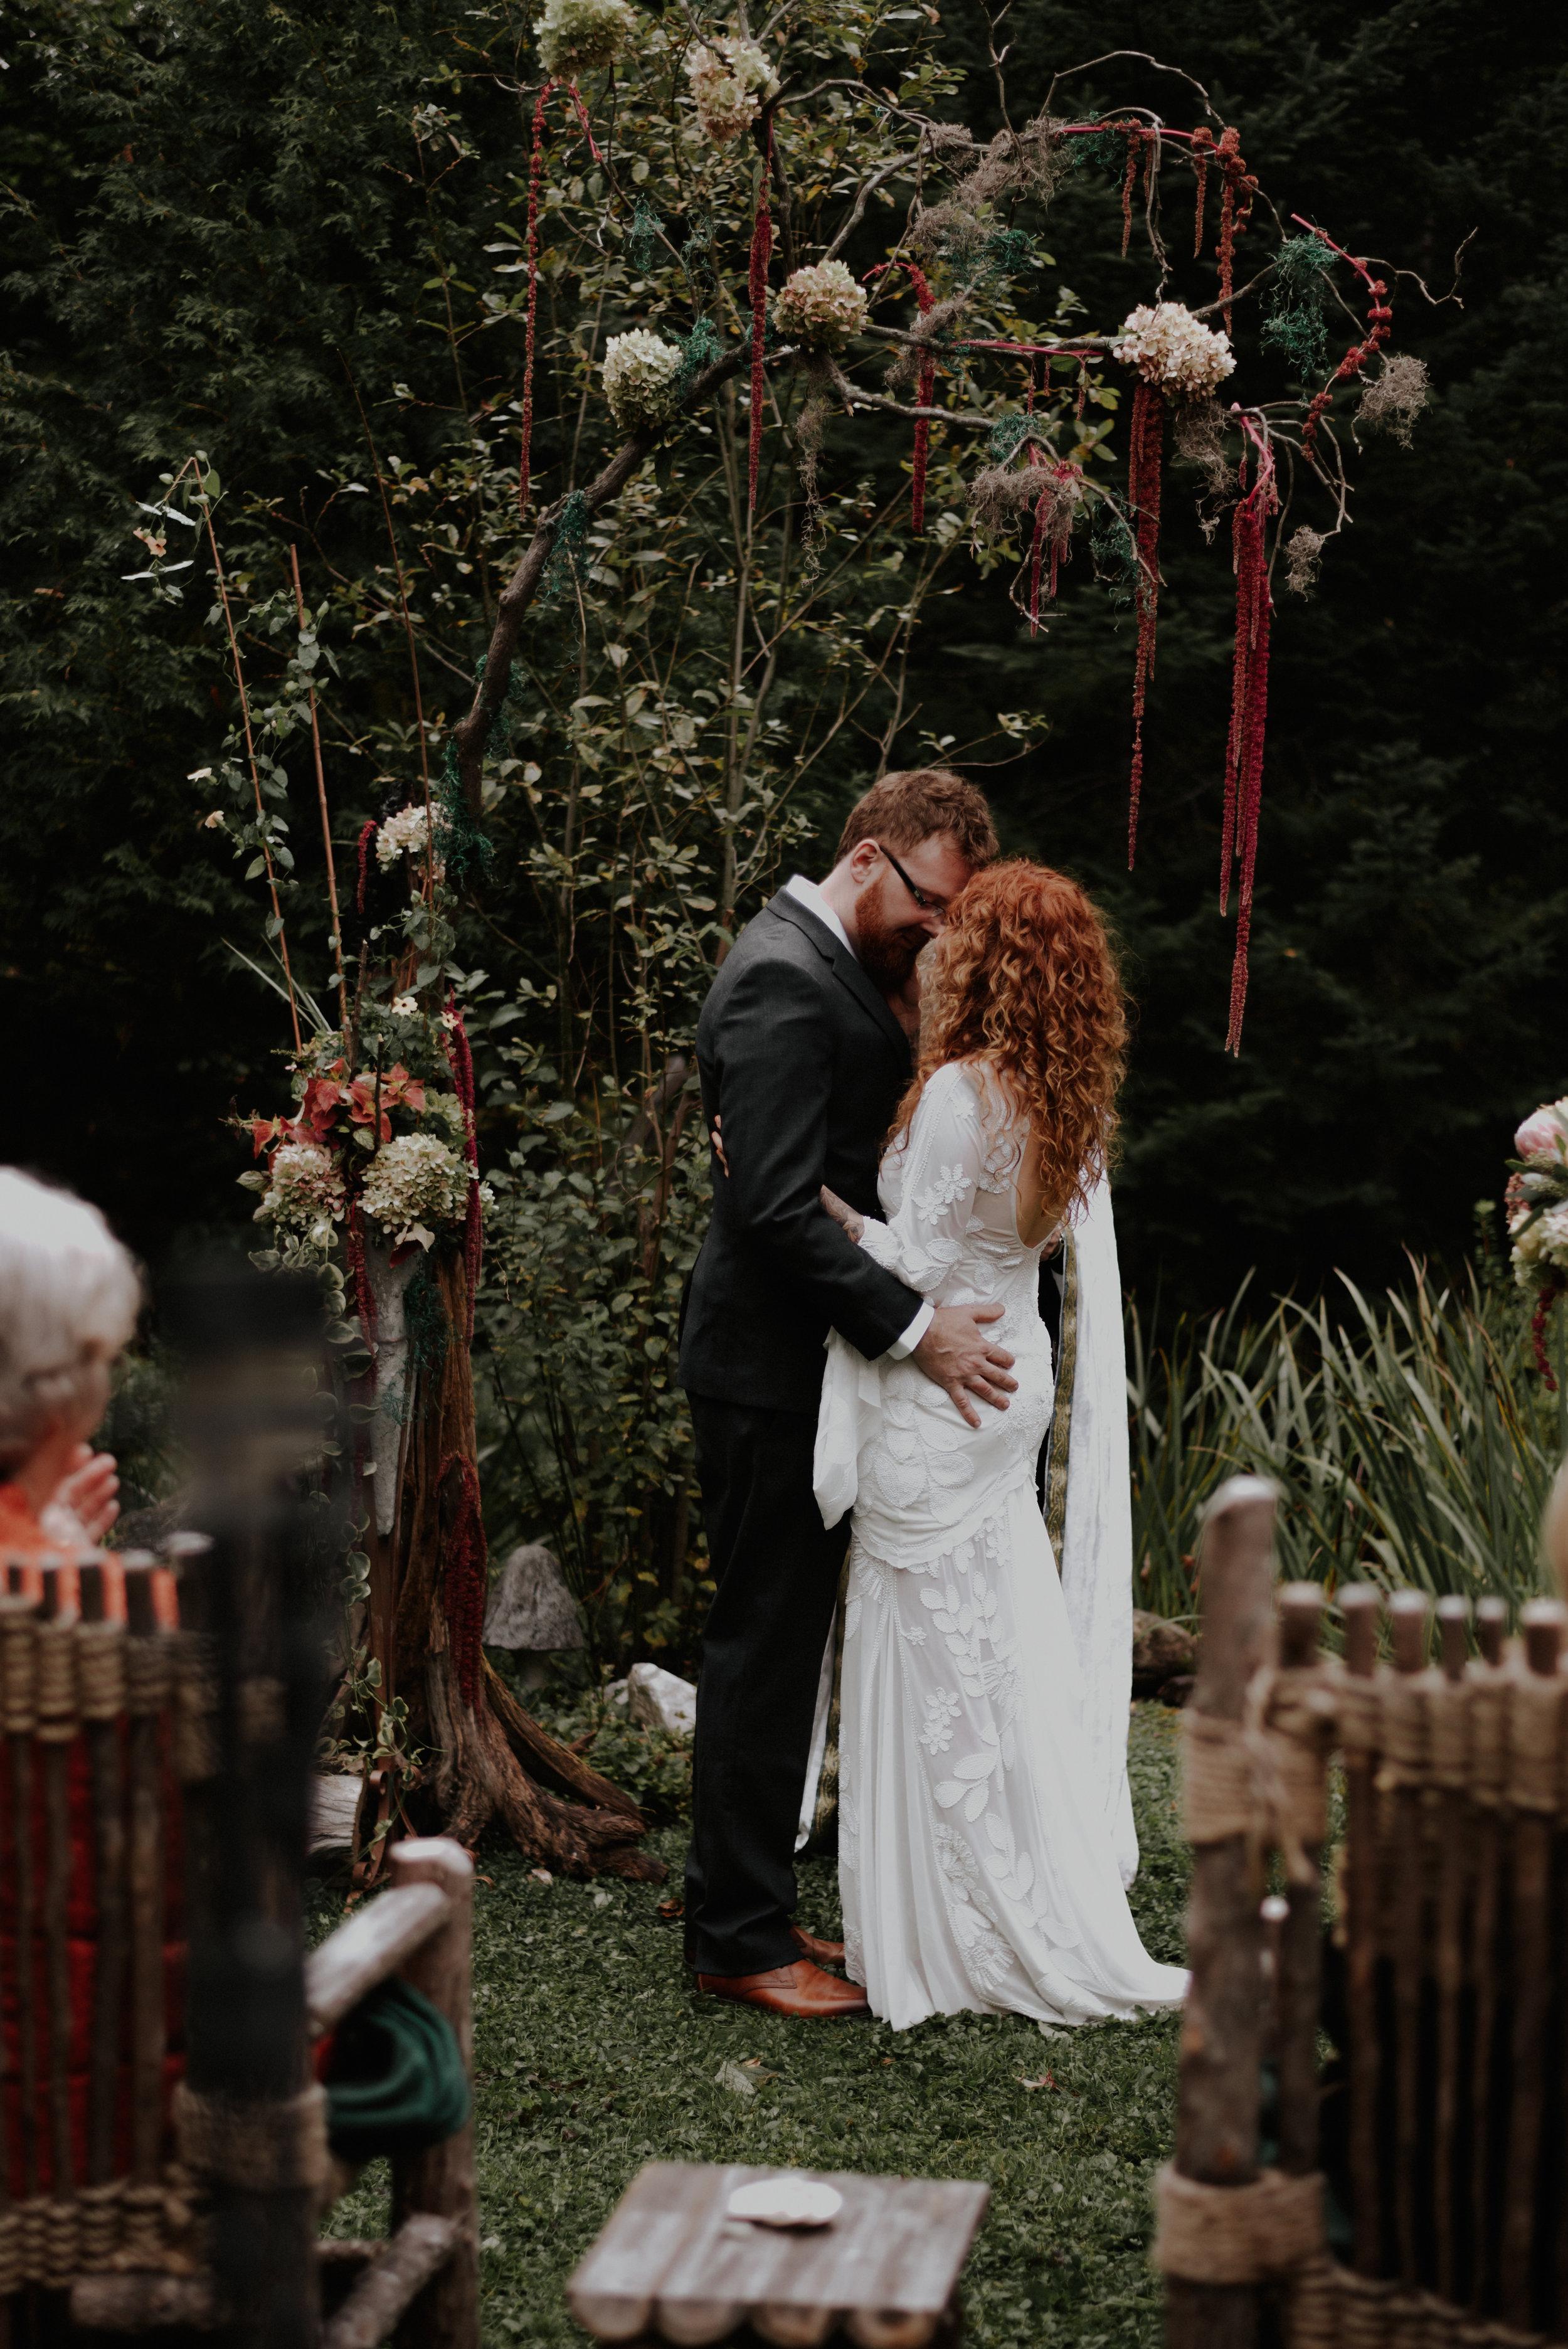 wildsoulsstudio-woodland-intimate-newengland-wedding-lake willoughby-96.jpg